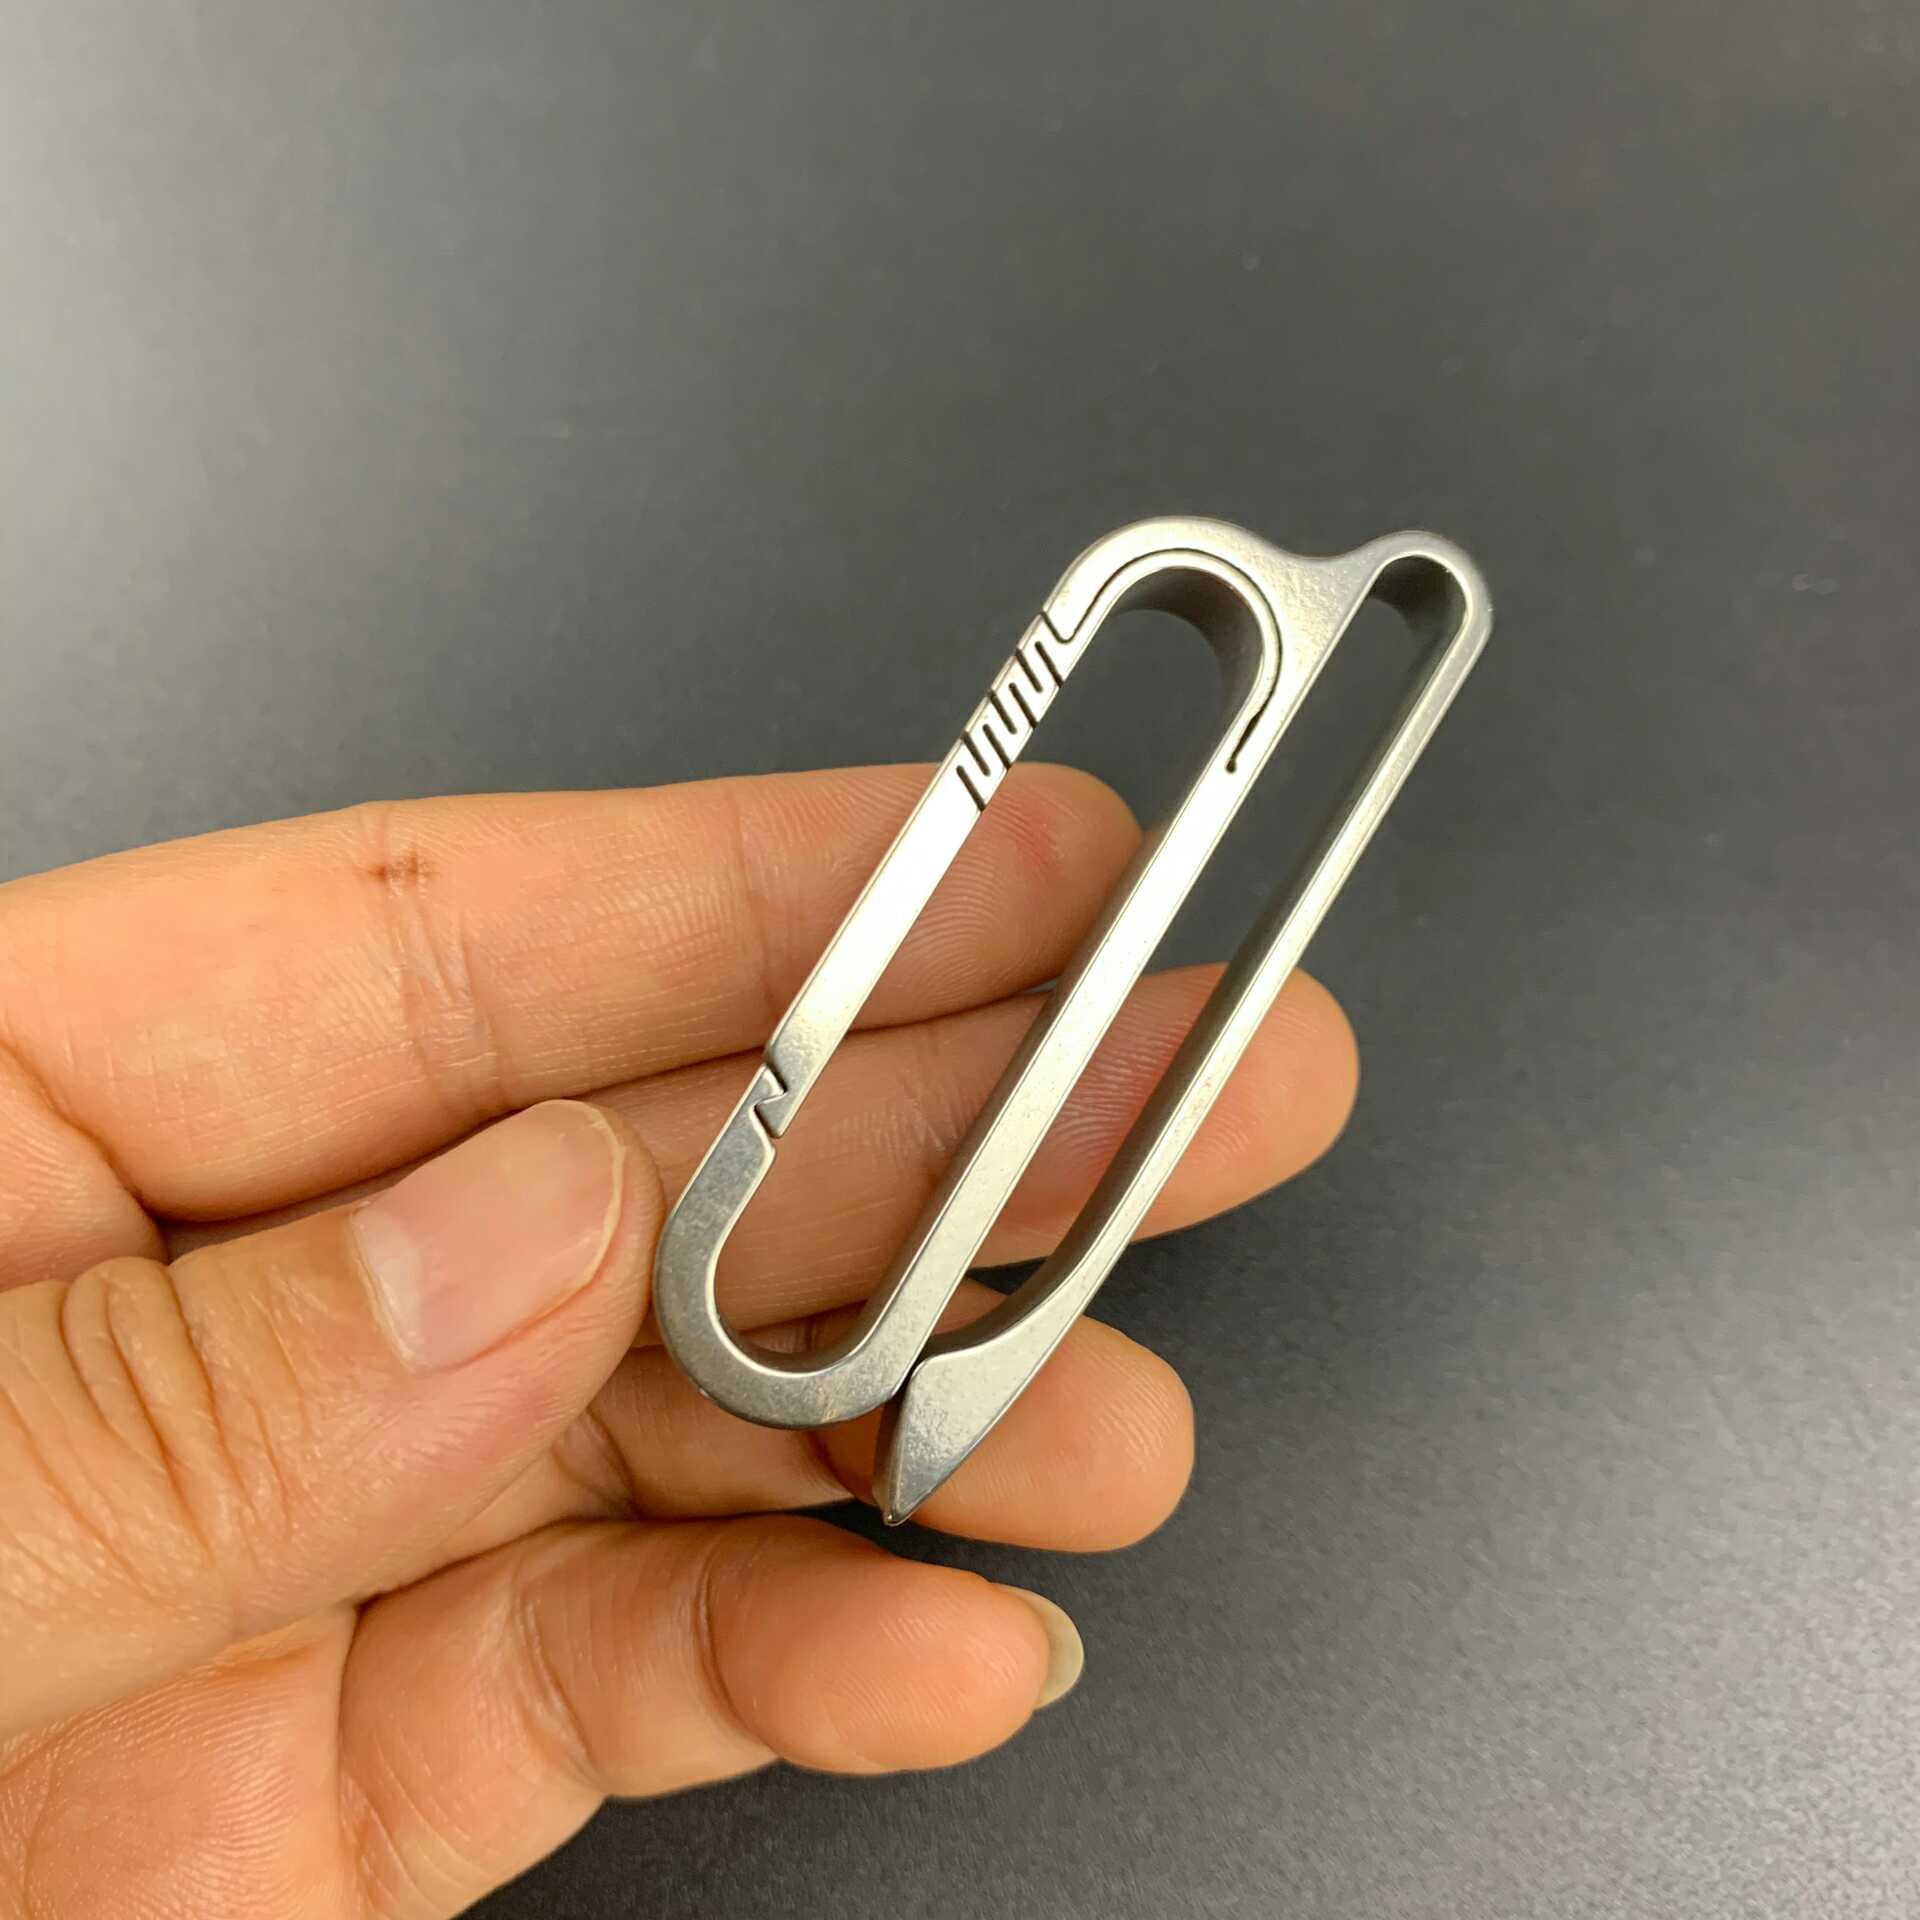 Pure Titanium Belt Loop Keychain With Detachable Clips Belt Key Ring Holder Heavy Duty Belt Key Clip Key Chains Aliexpress